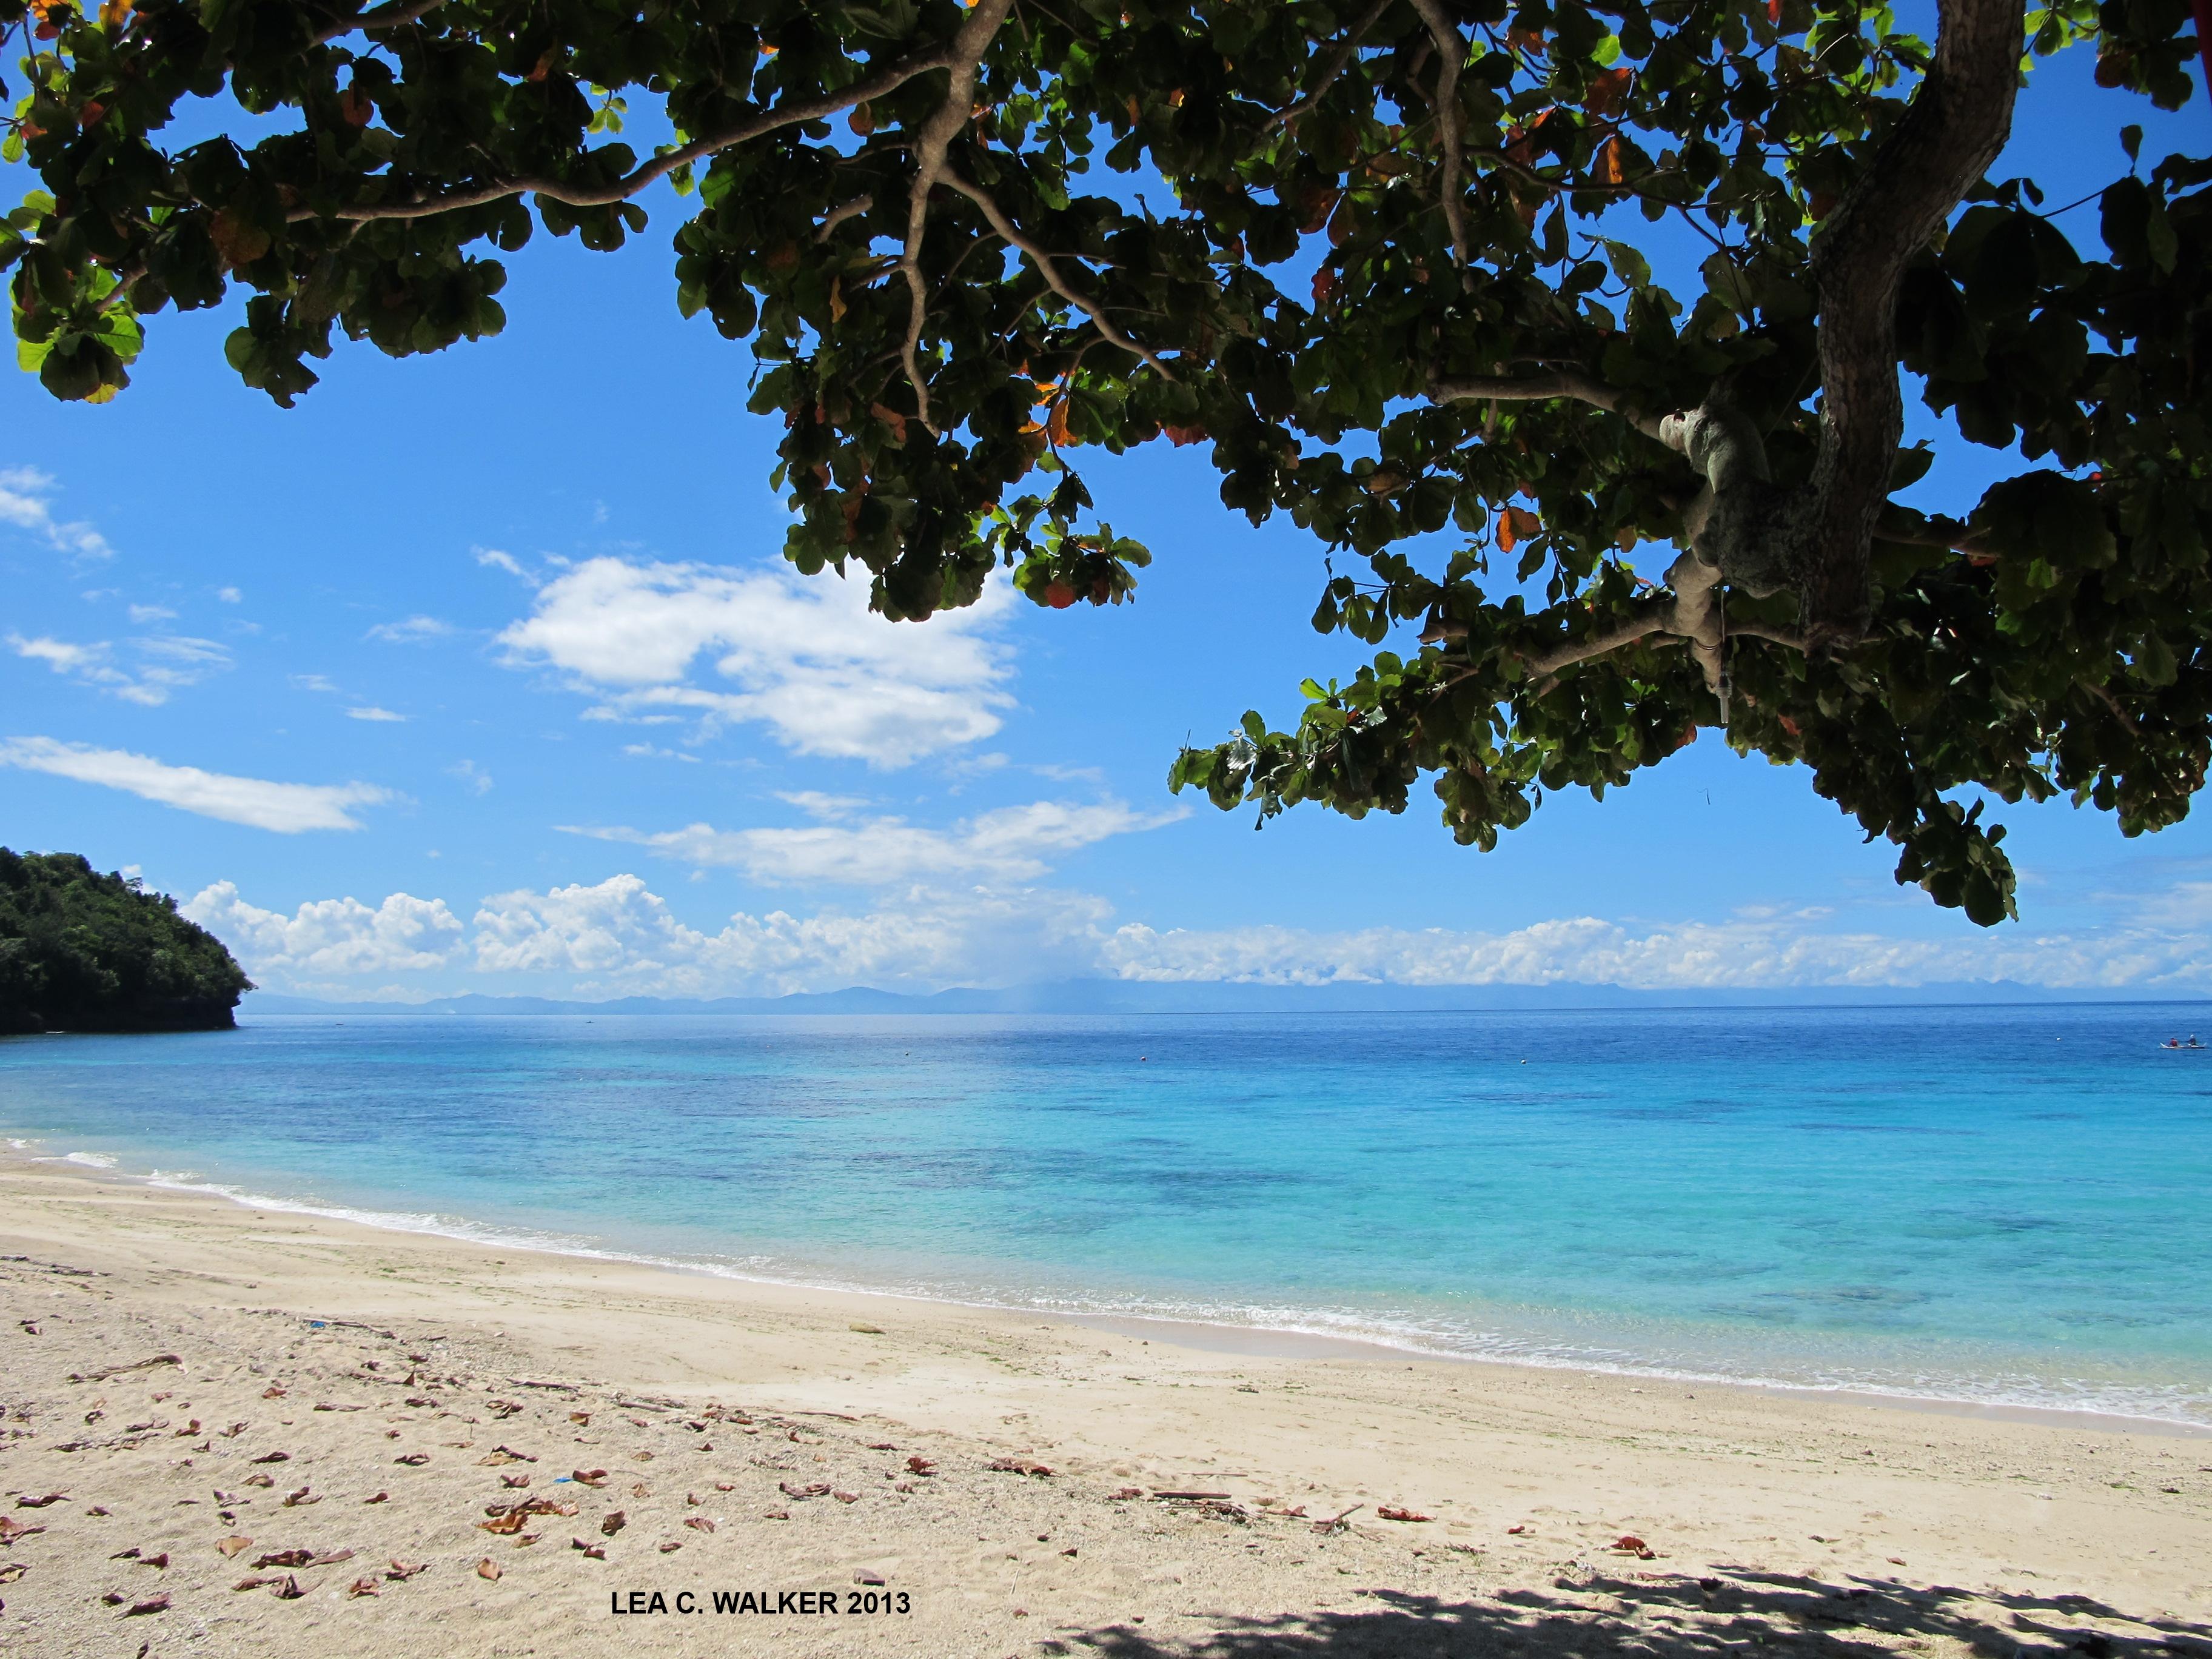 Samal Island Leawalkerblog